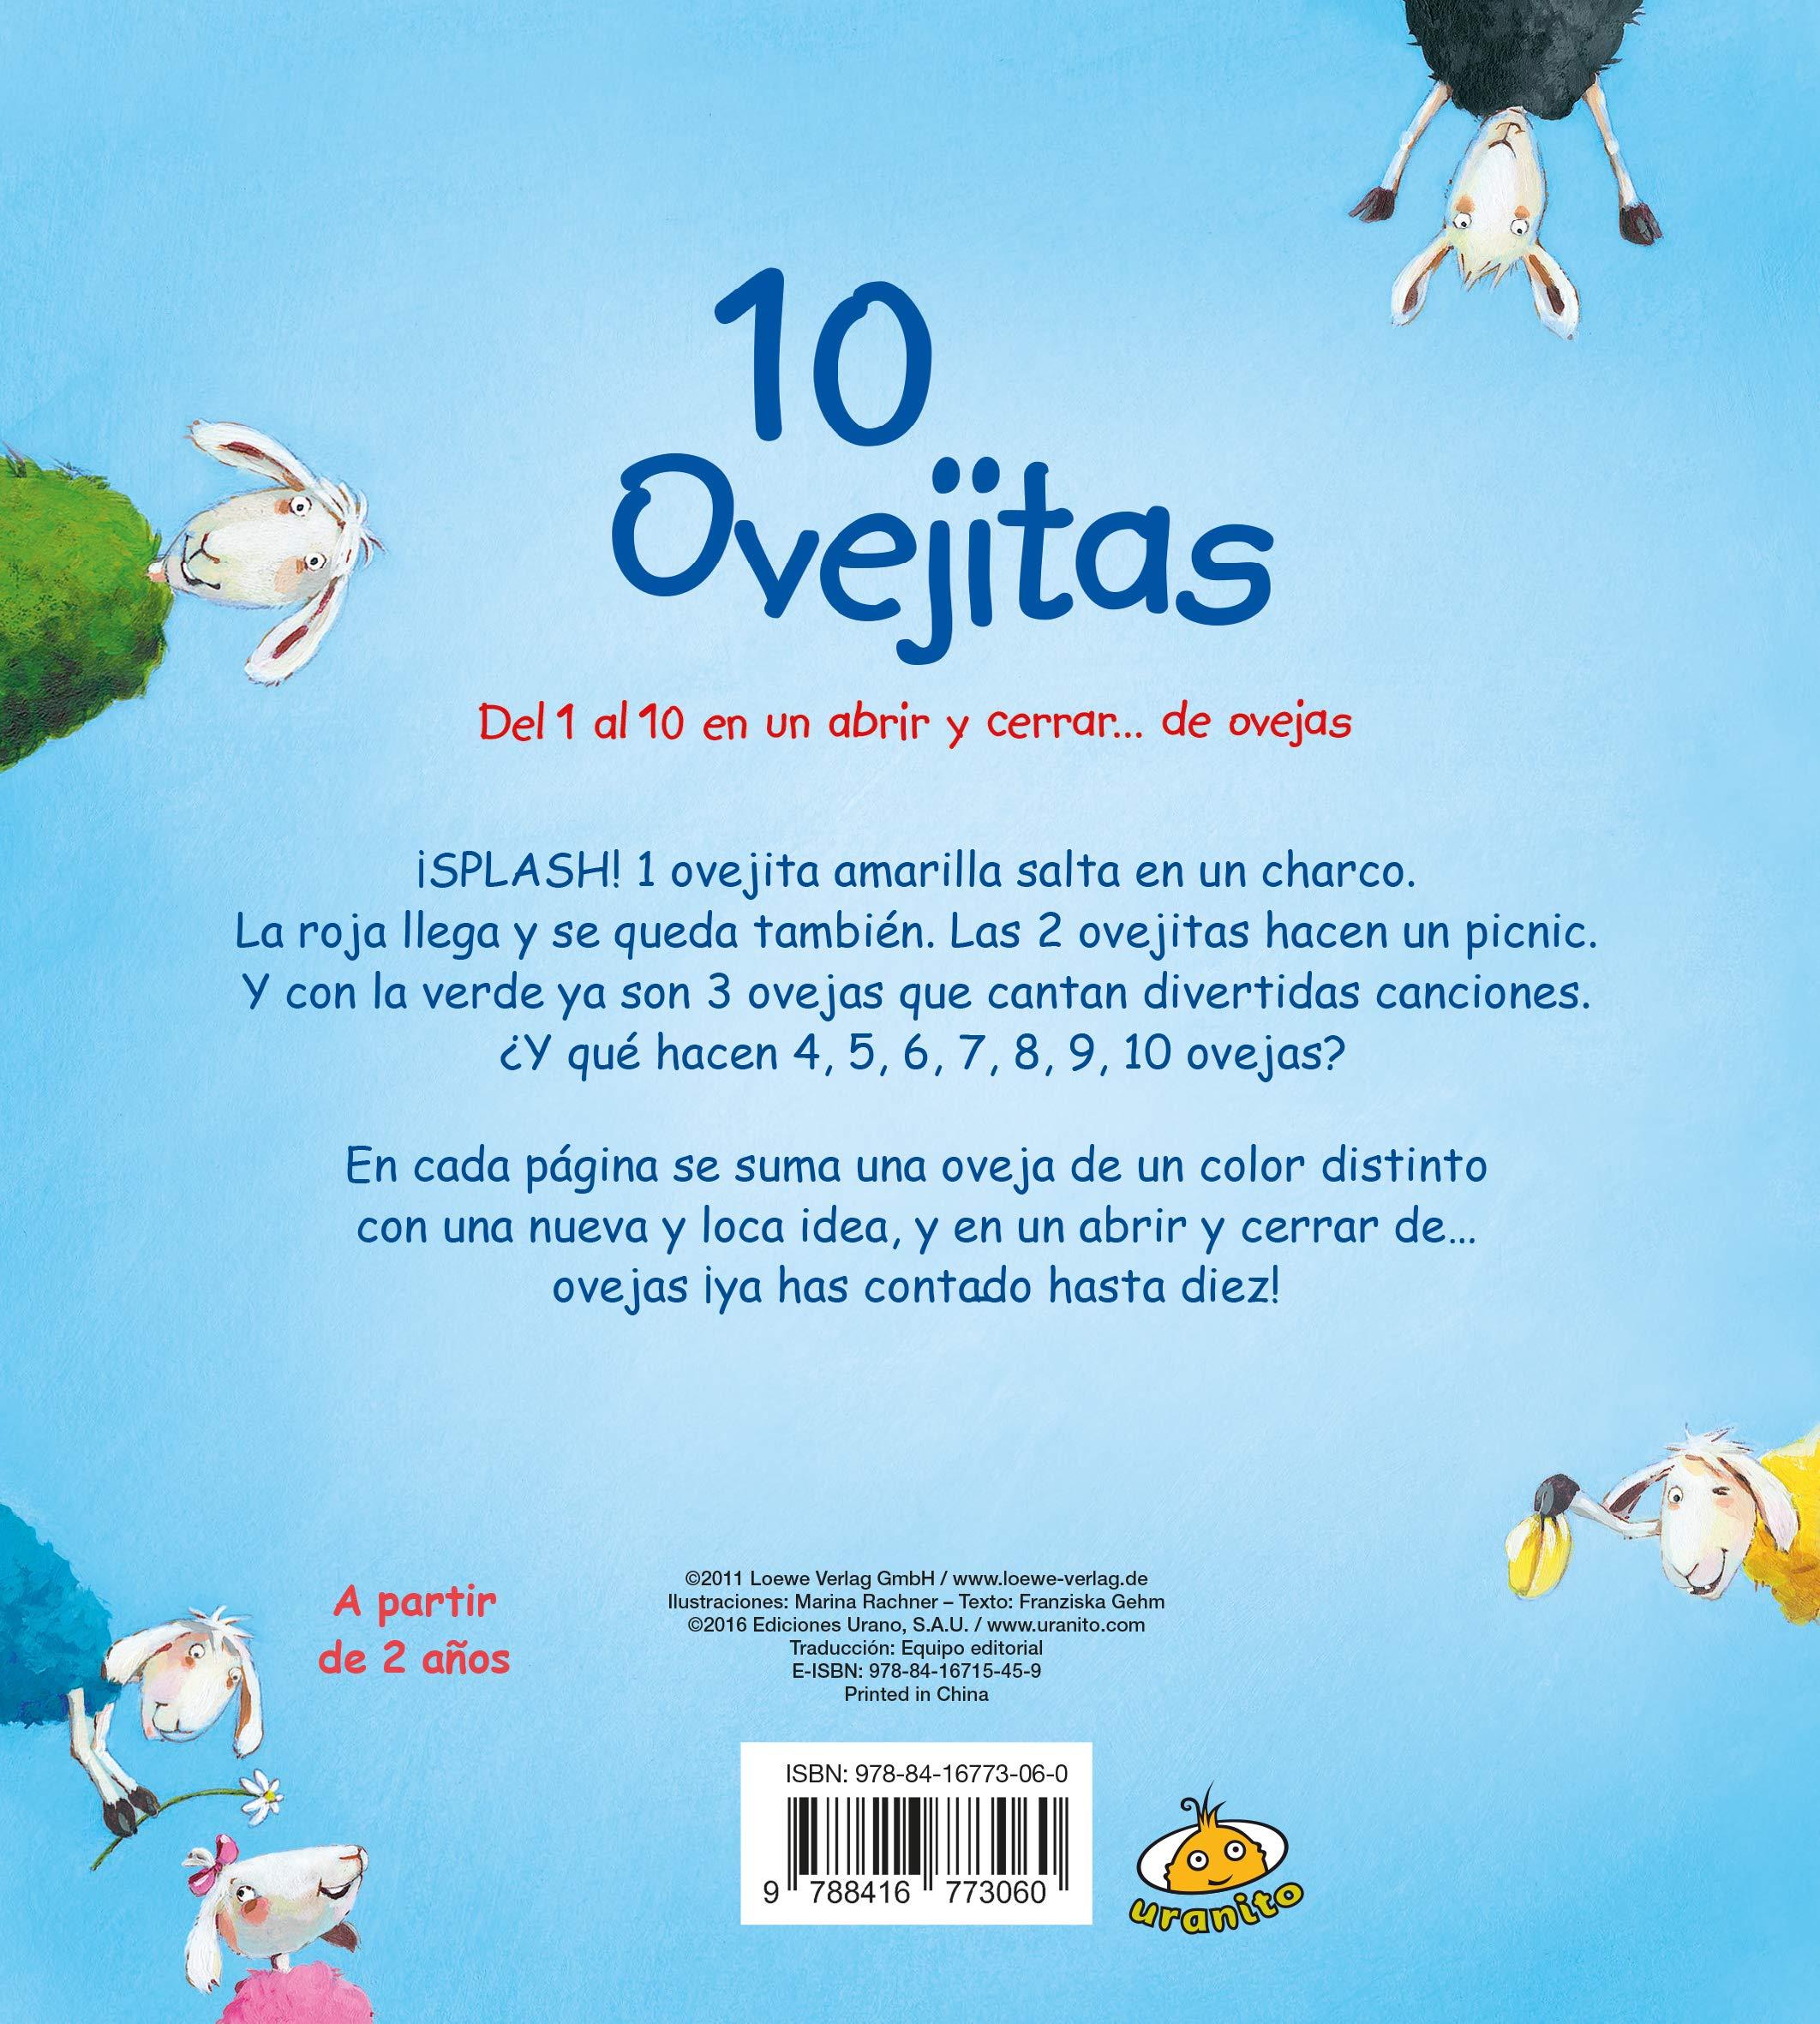 ea9be7c0518 10 ovejitas (Bebeteca)  Amazon.es  FRANZISKA GEHM  Libros